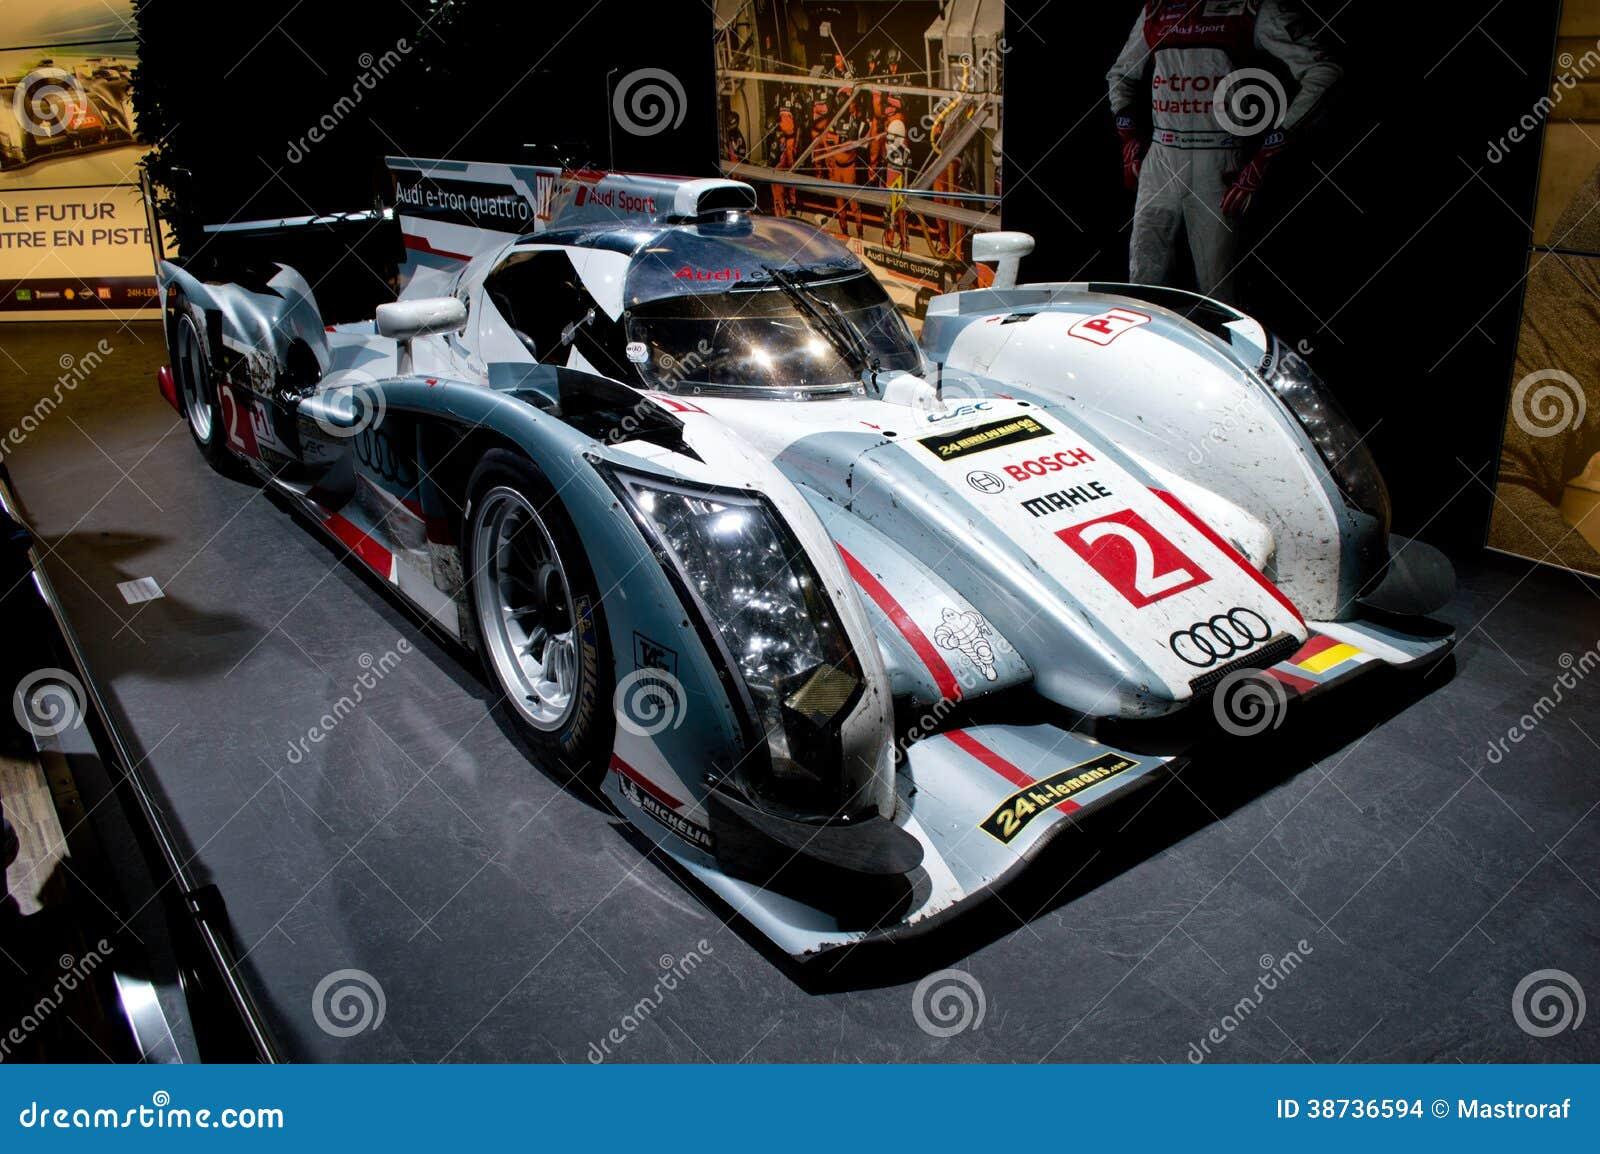 Audi r18 geneva 2014 editorial stock image image 38736594 - Salon de the le mans ...